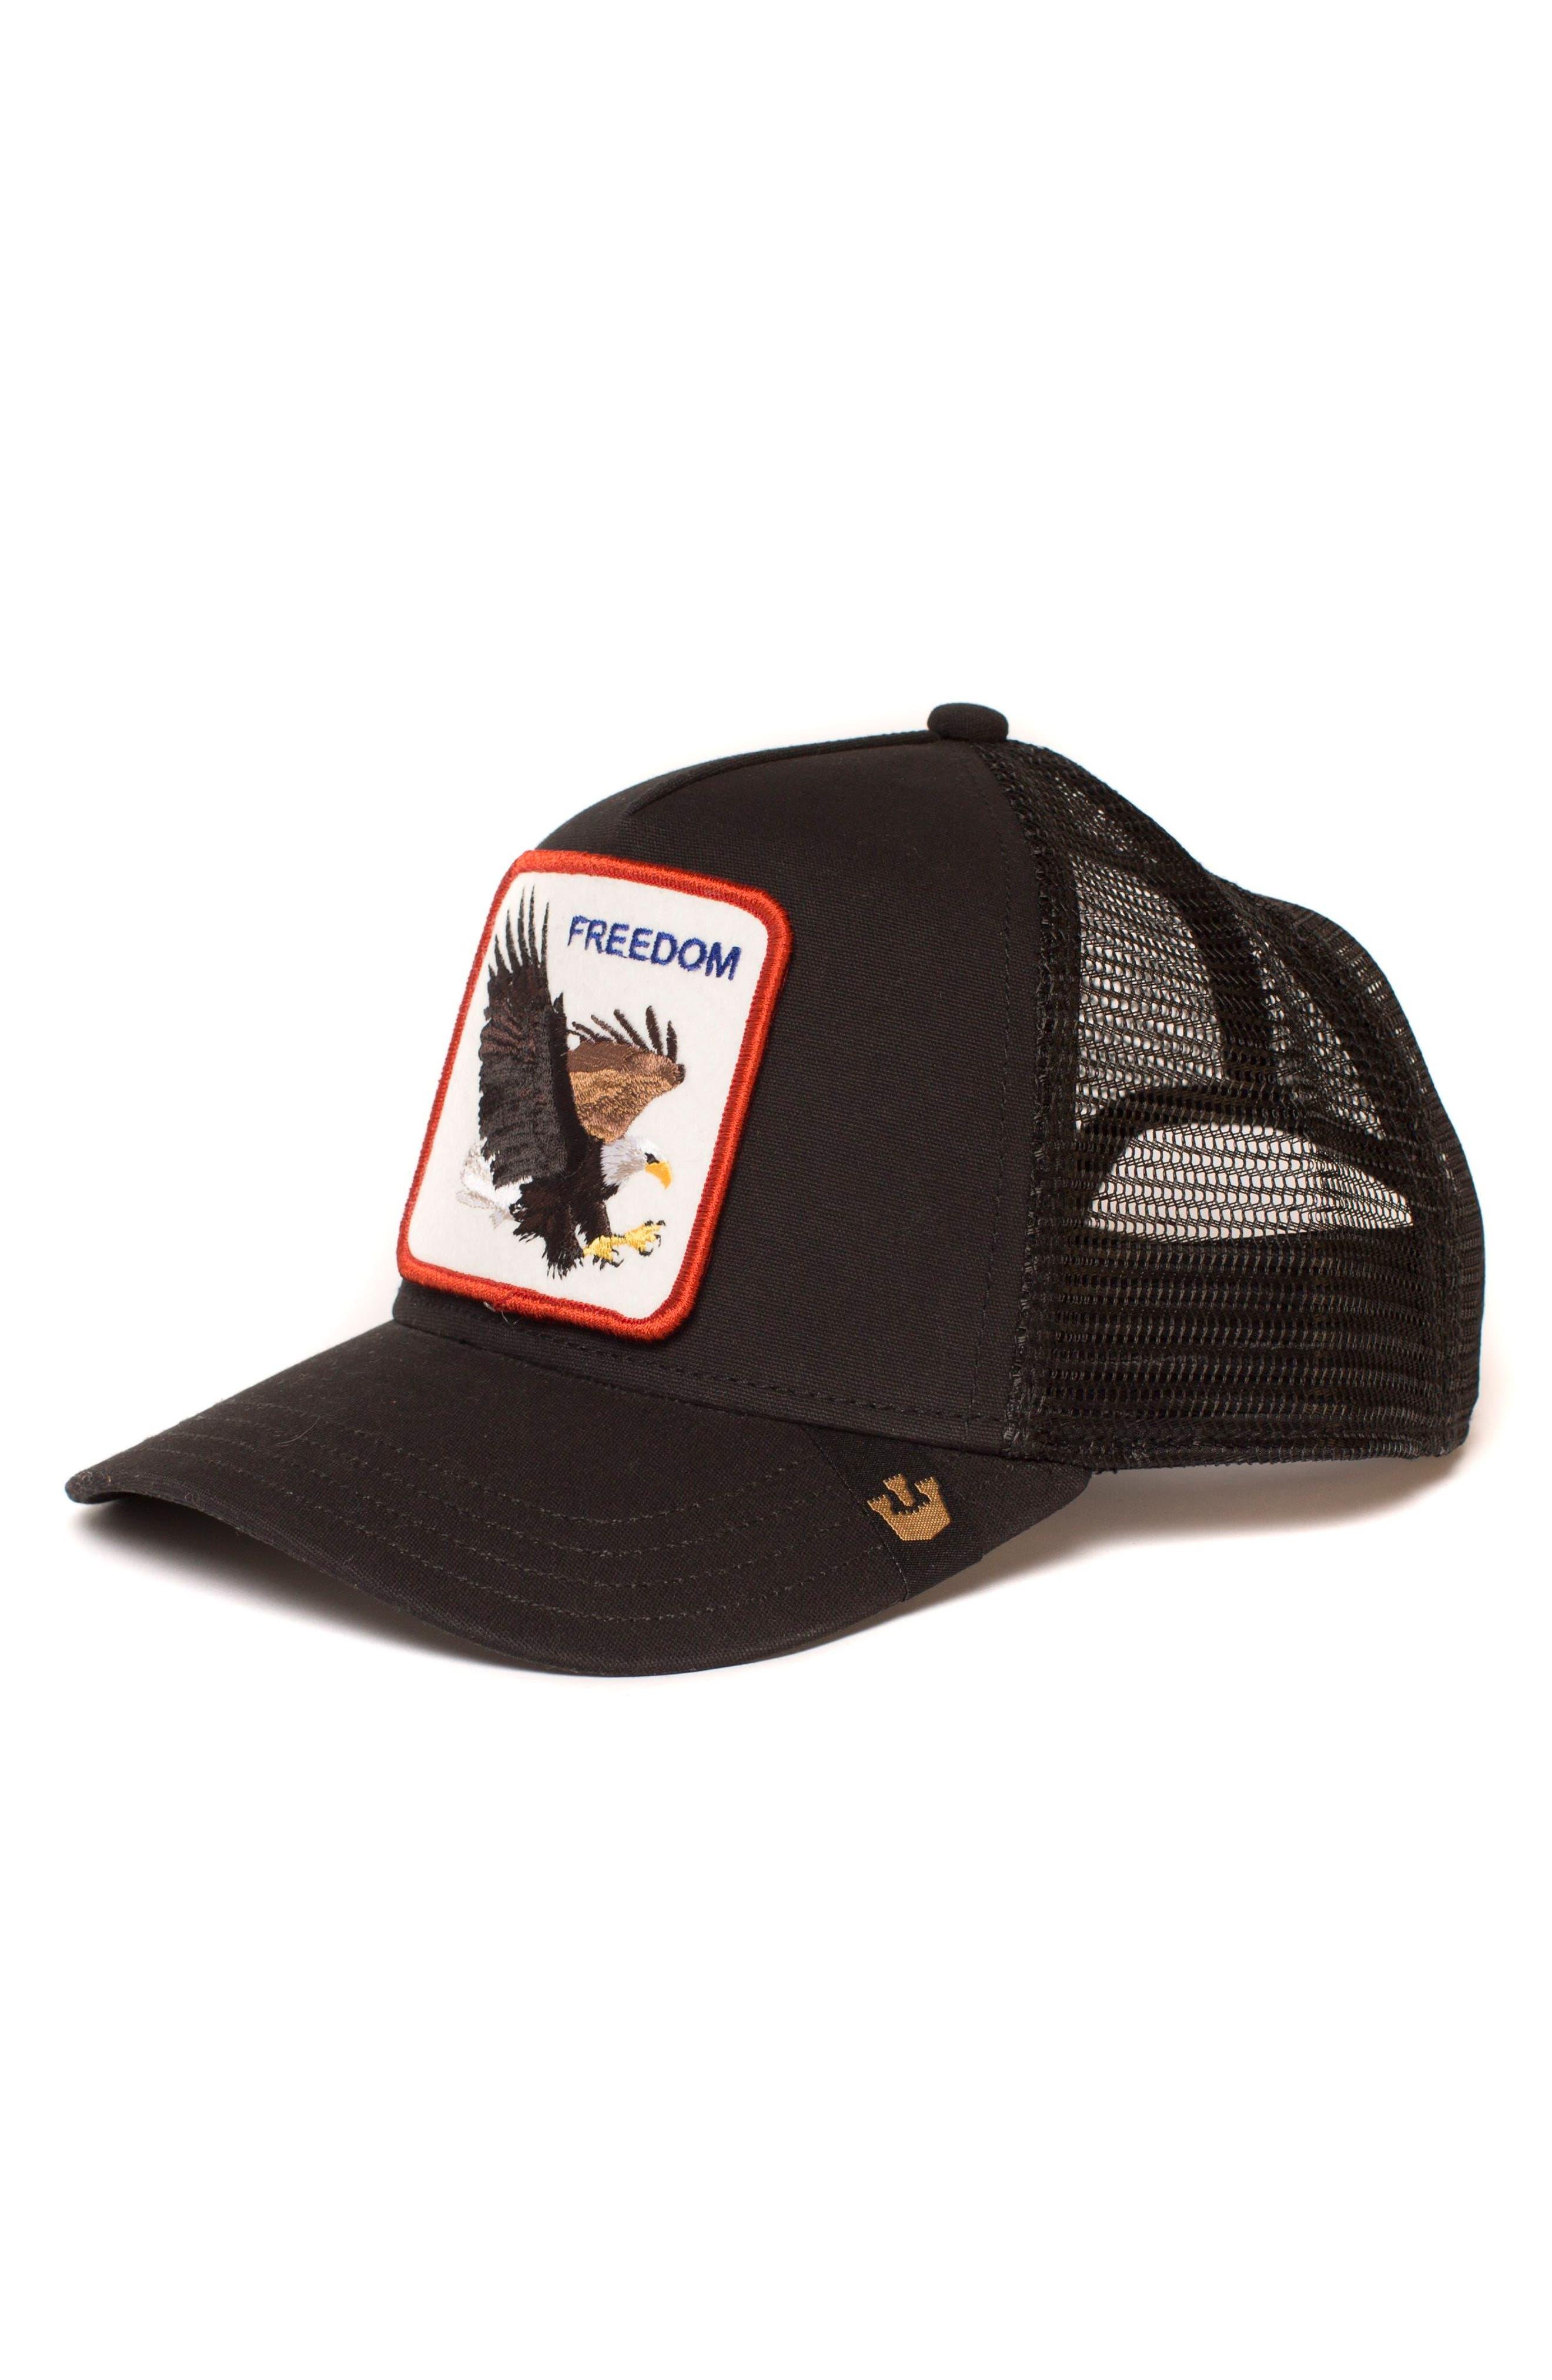 Freedom Trucker Hat,                             Main thumbnail 1, color,                             001